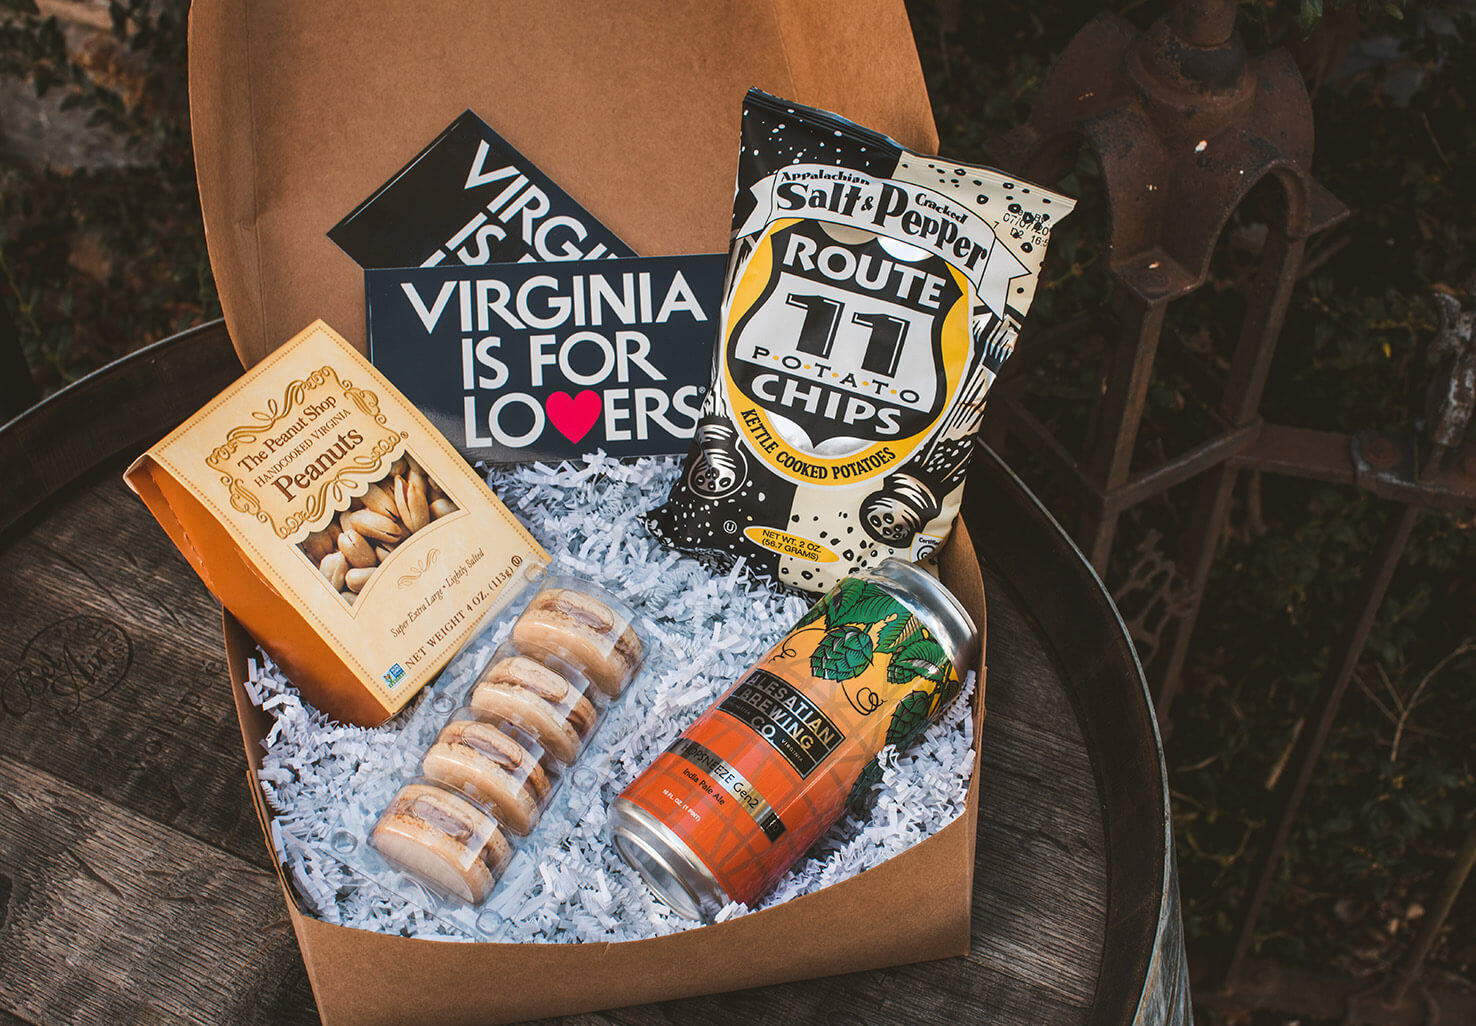 Shenandoah Getaway Virginia Welcome Snack Box